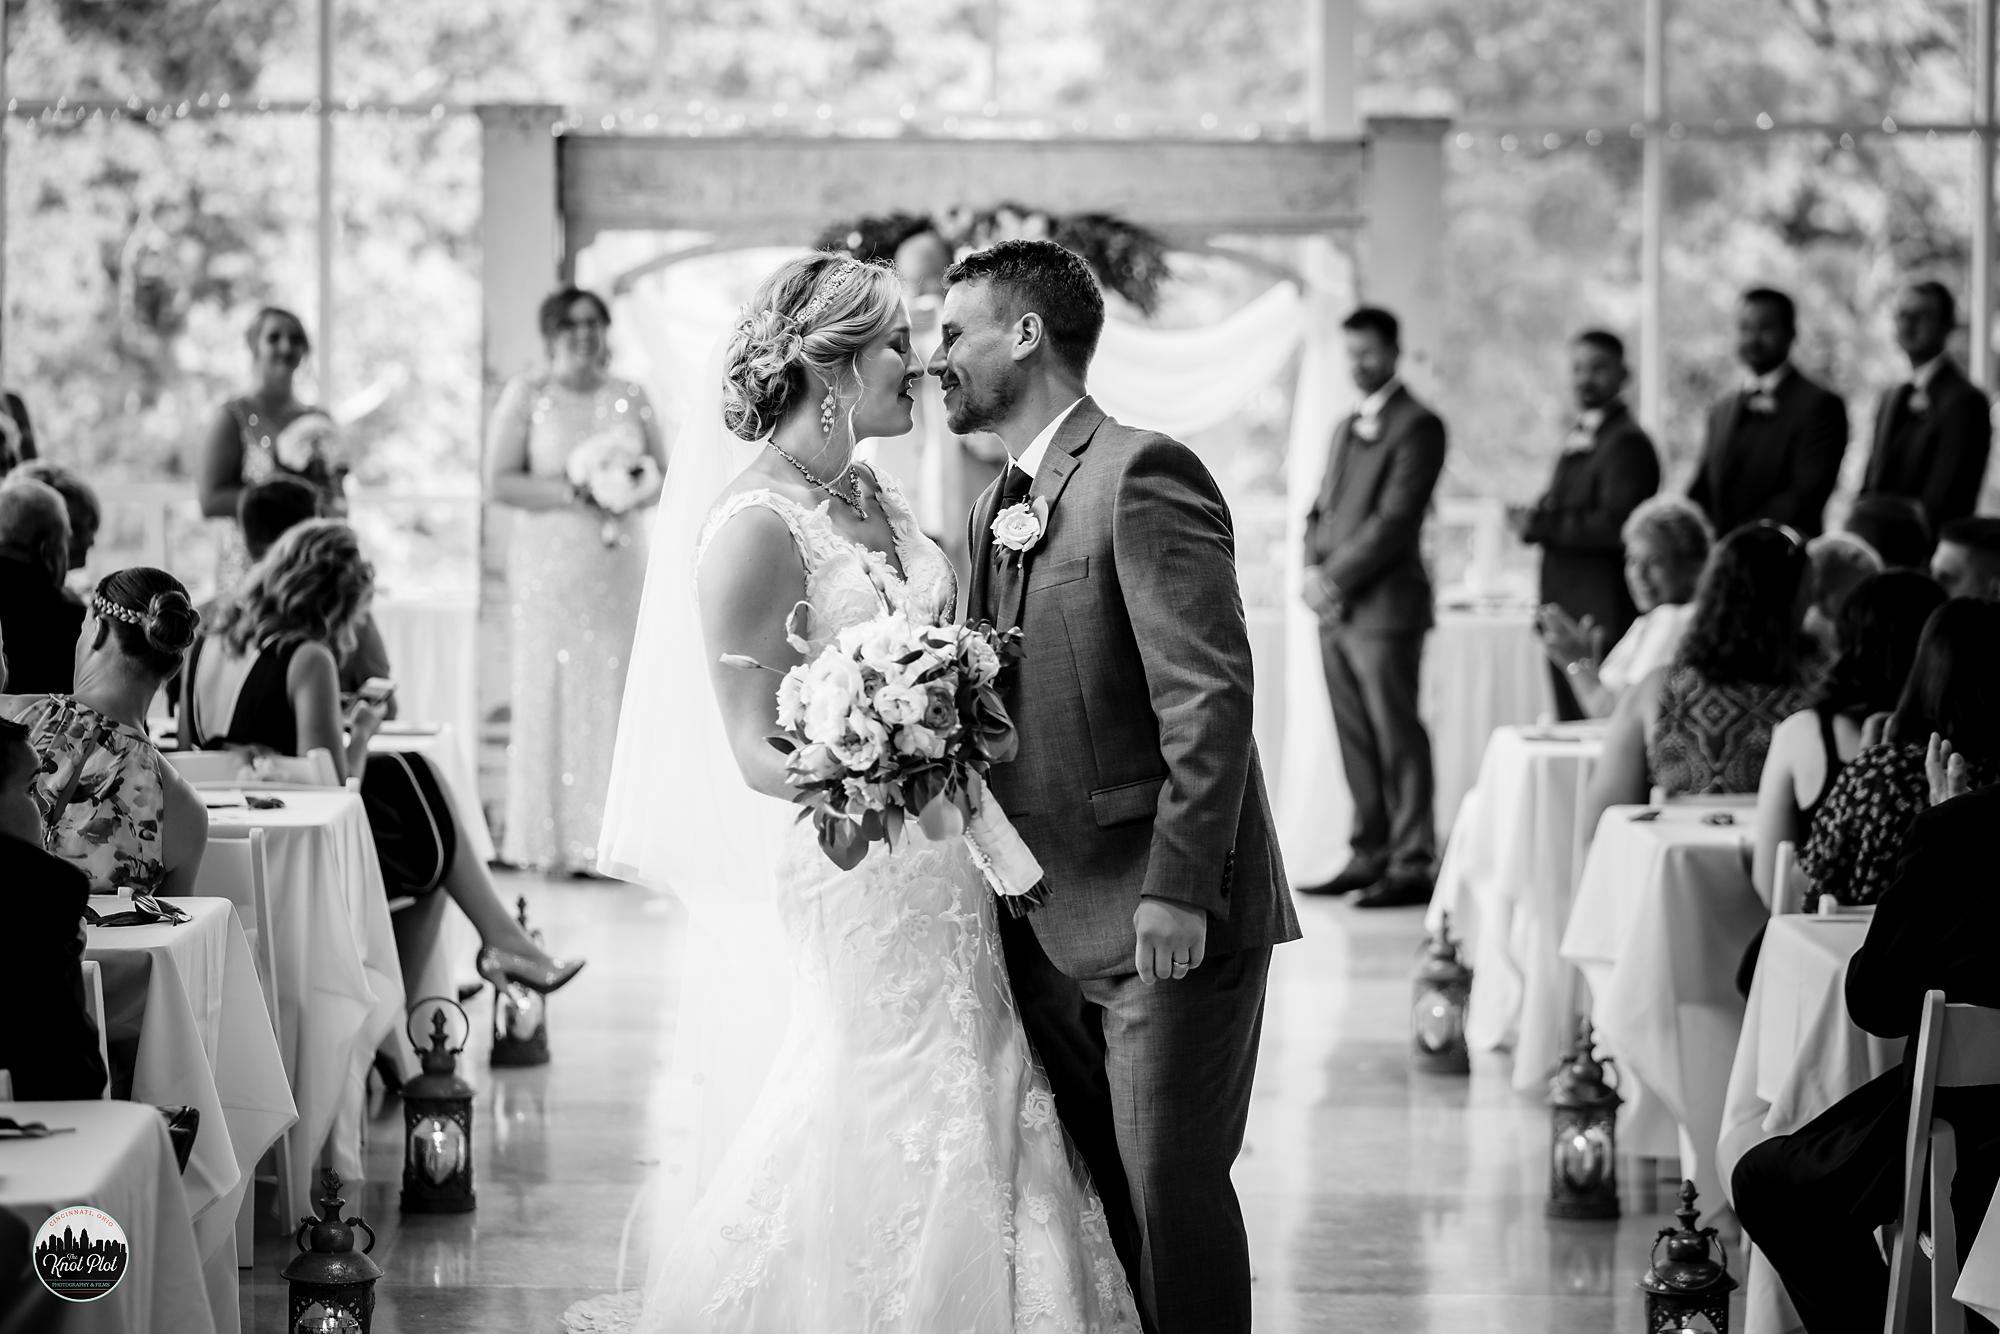 Southgate-Community-Center-KY-Wedding-Photography-14.jpg